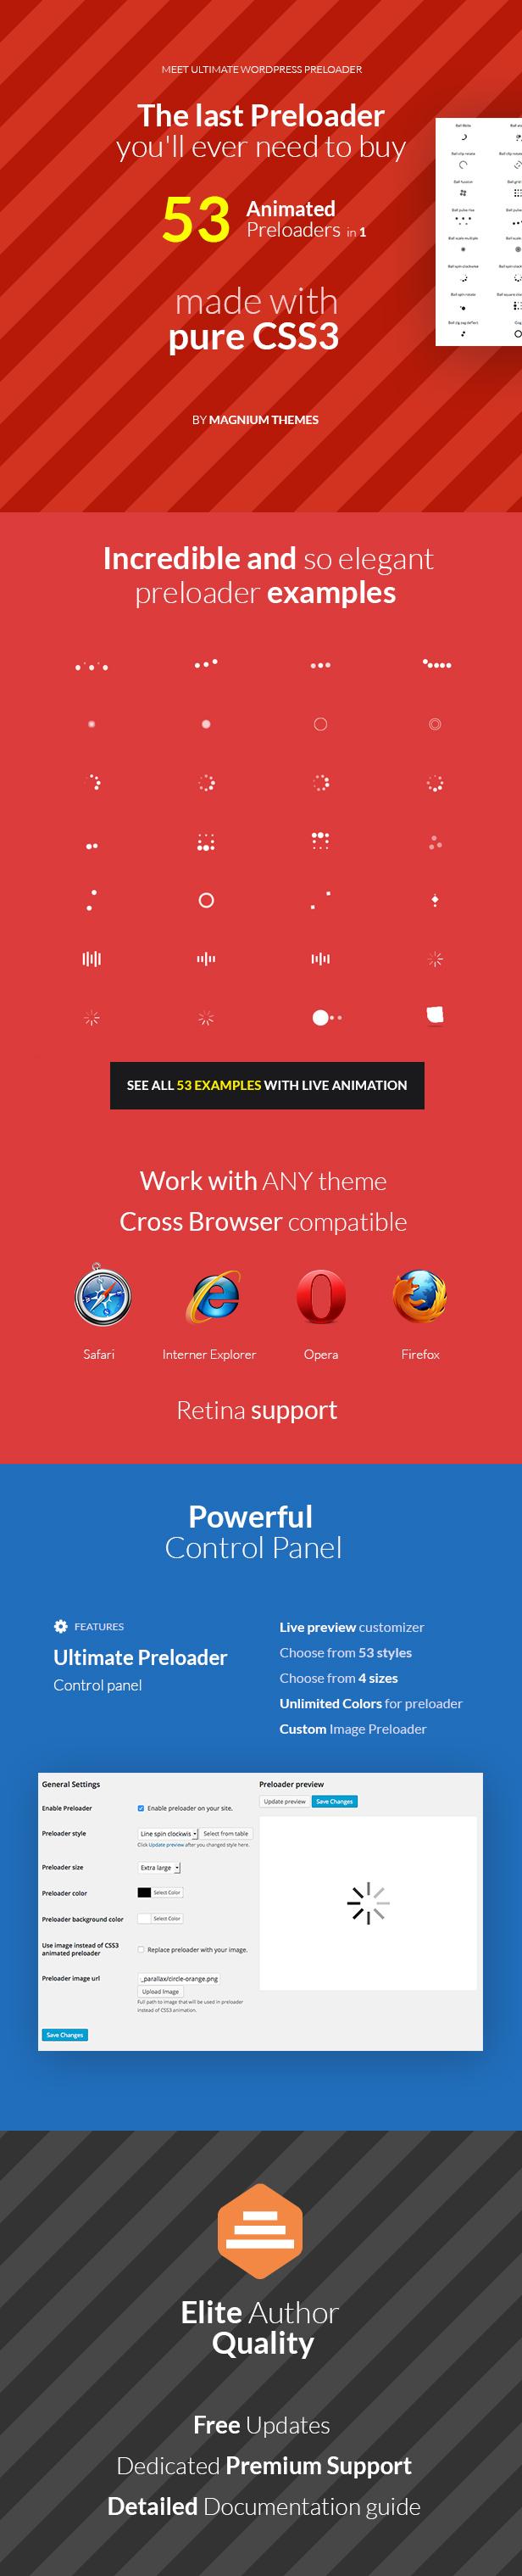 Ultimate WordPress Preloader - 53 CSS3 Preloaders